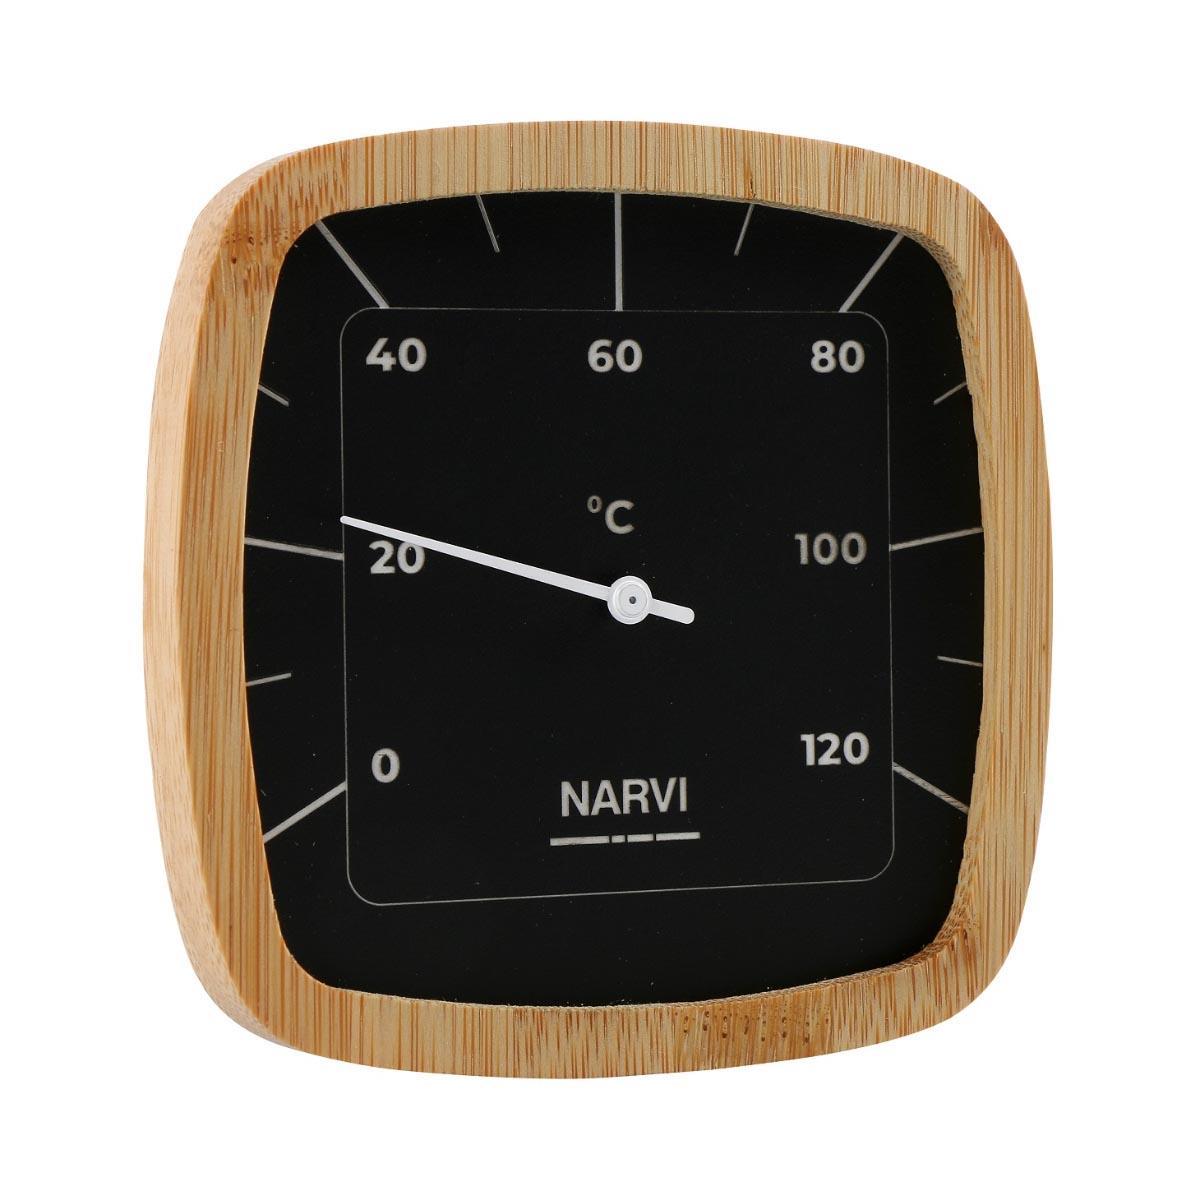 Stylish sauna thermometer